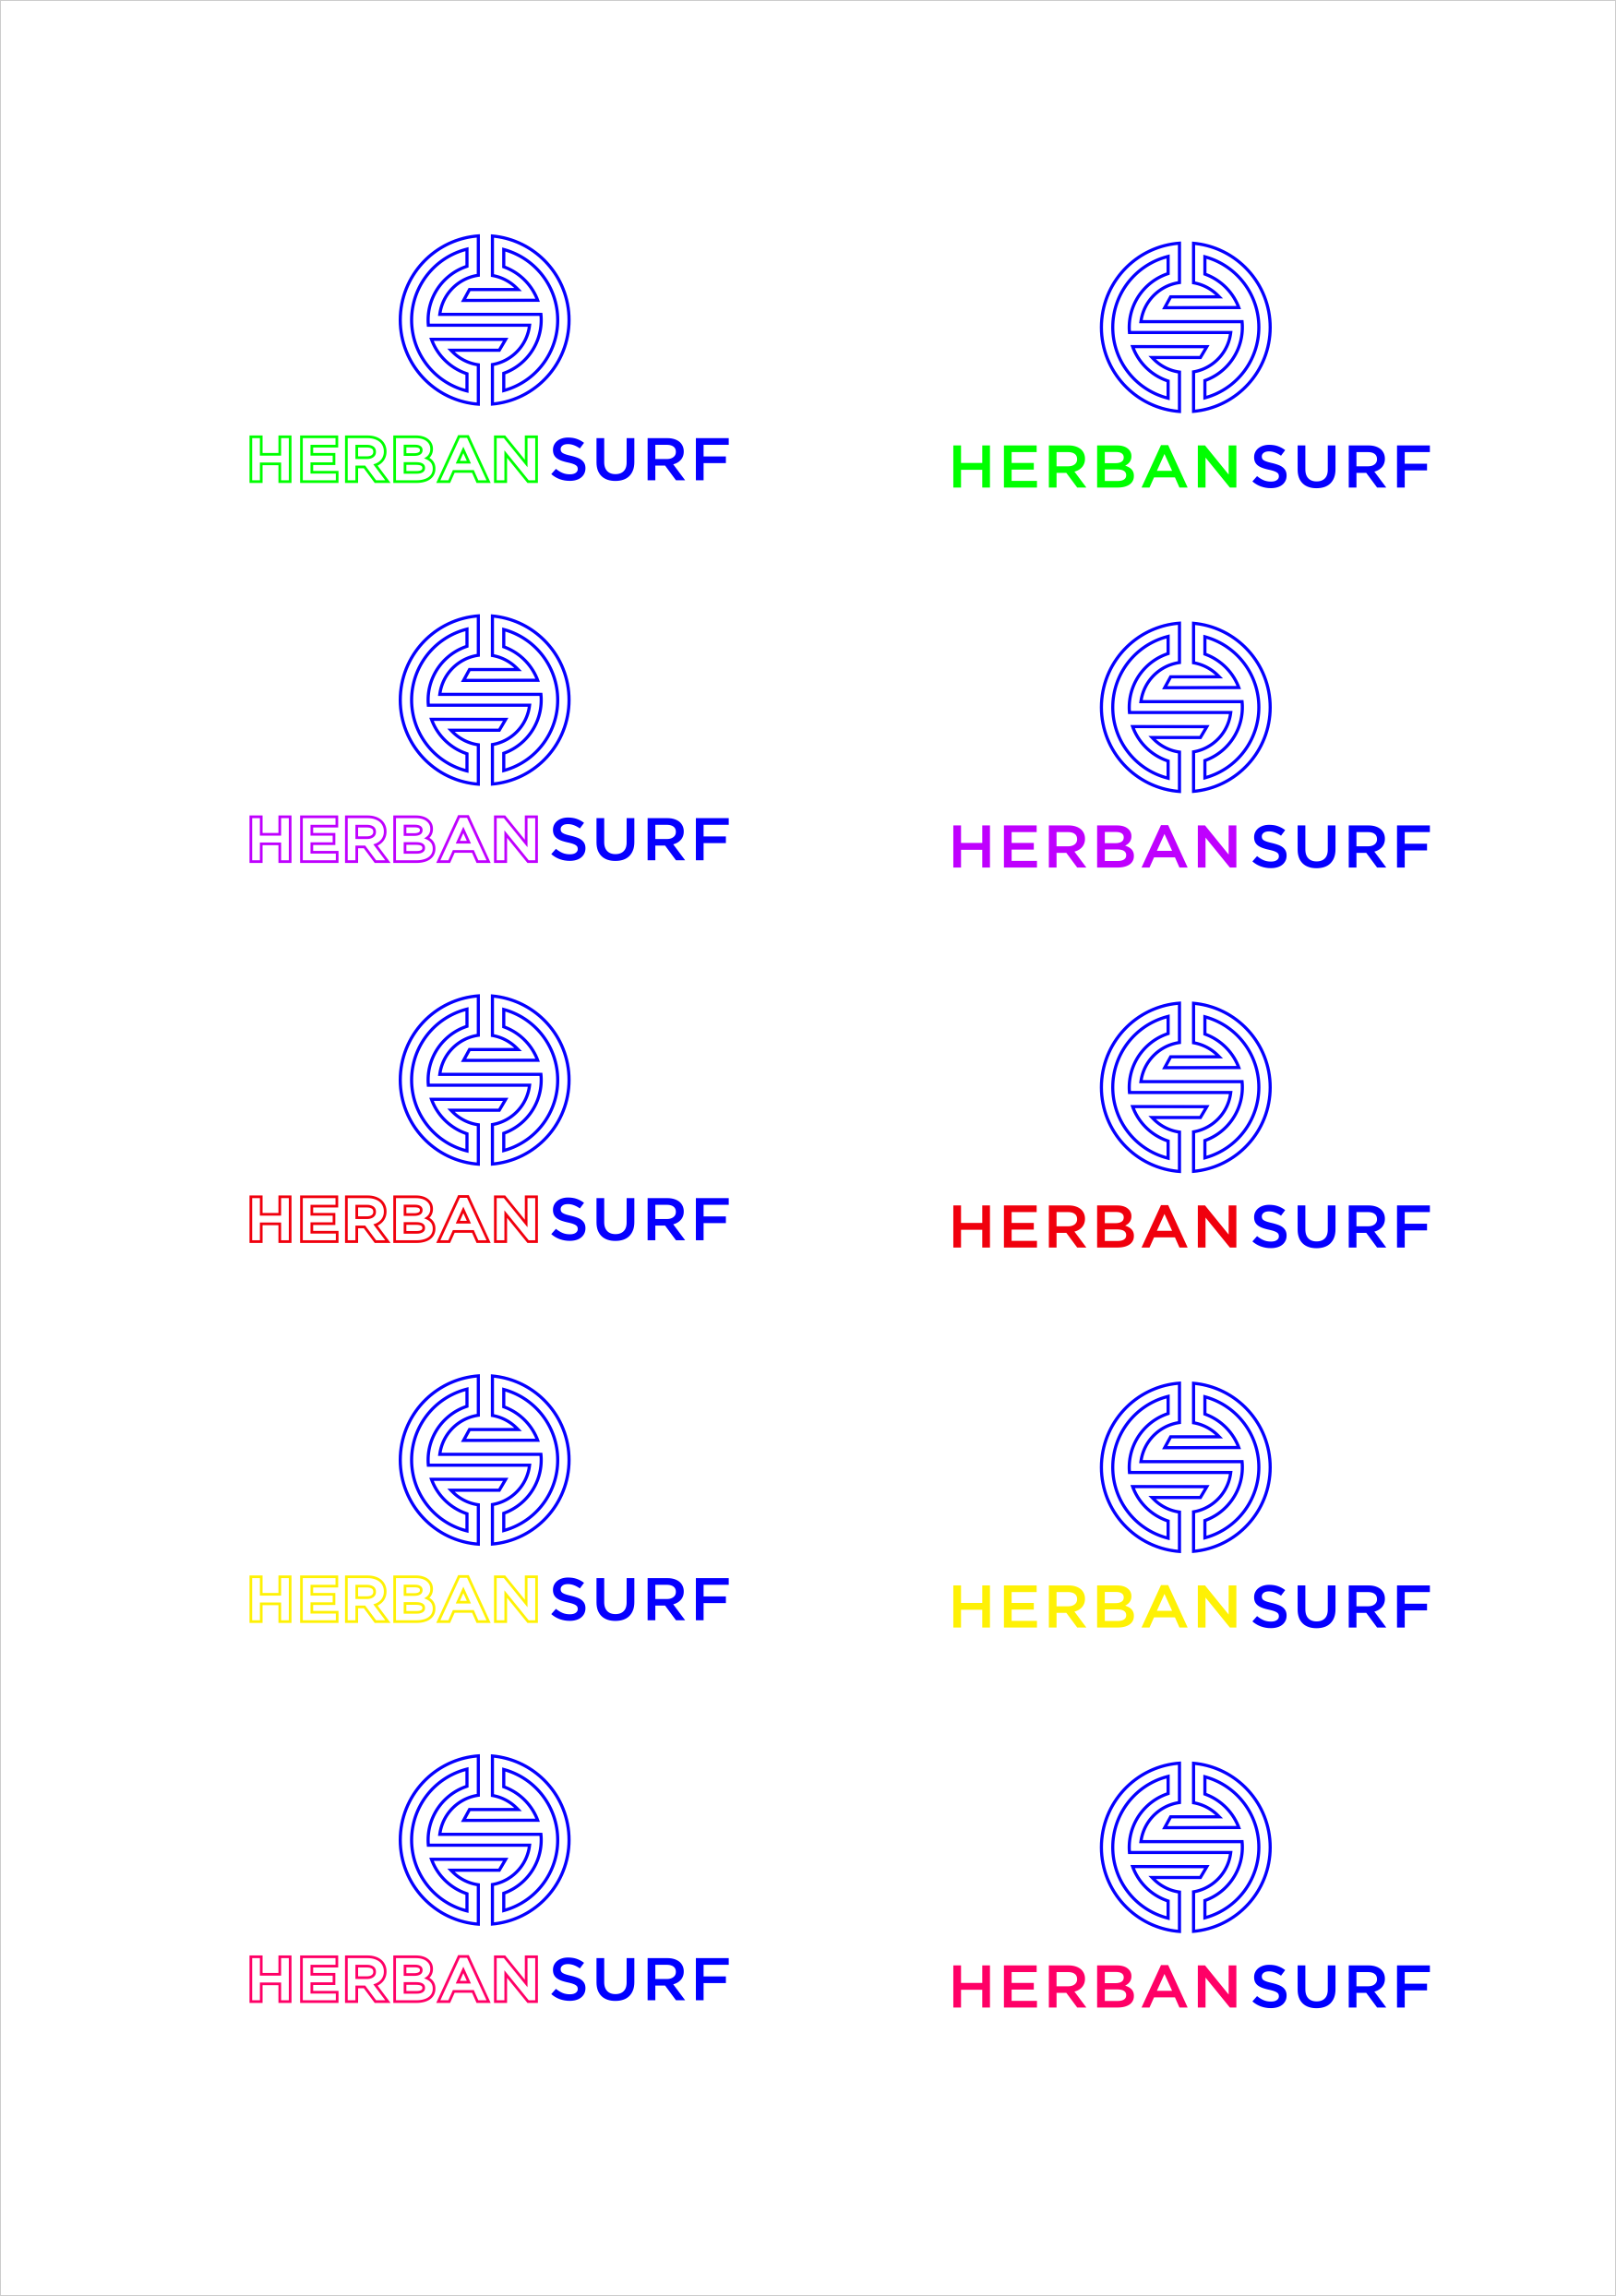 HerbanSurf